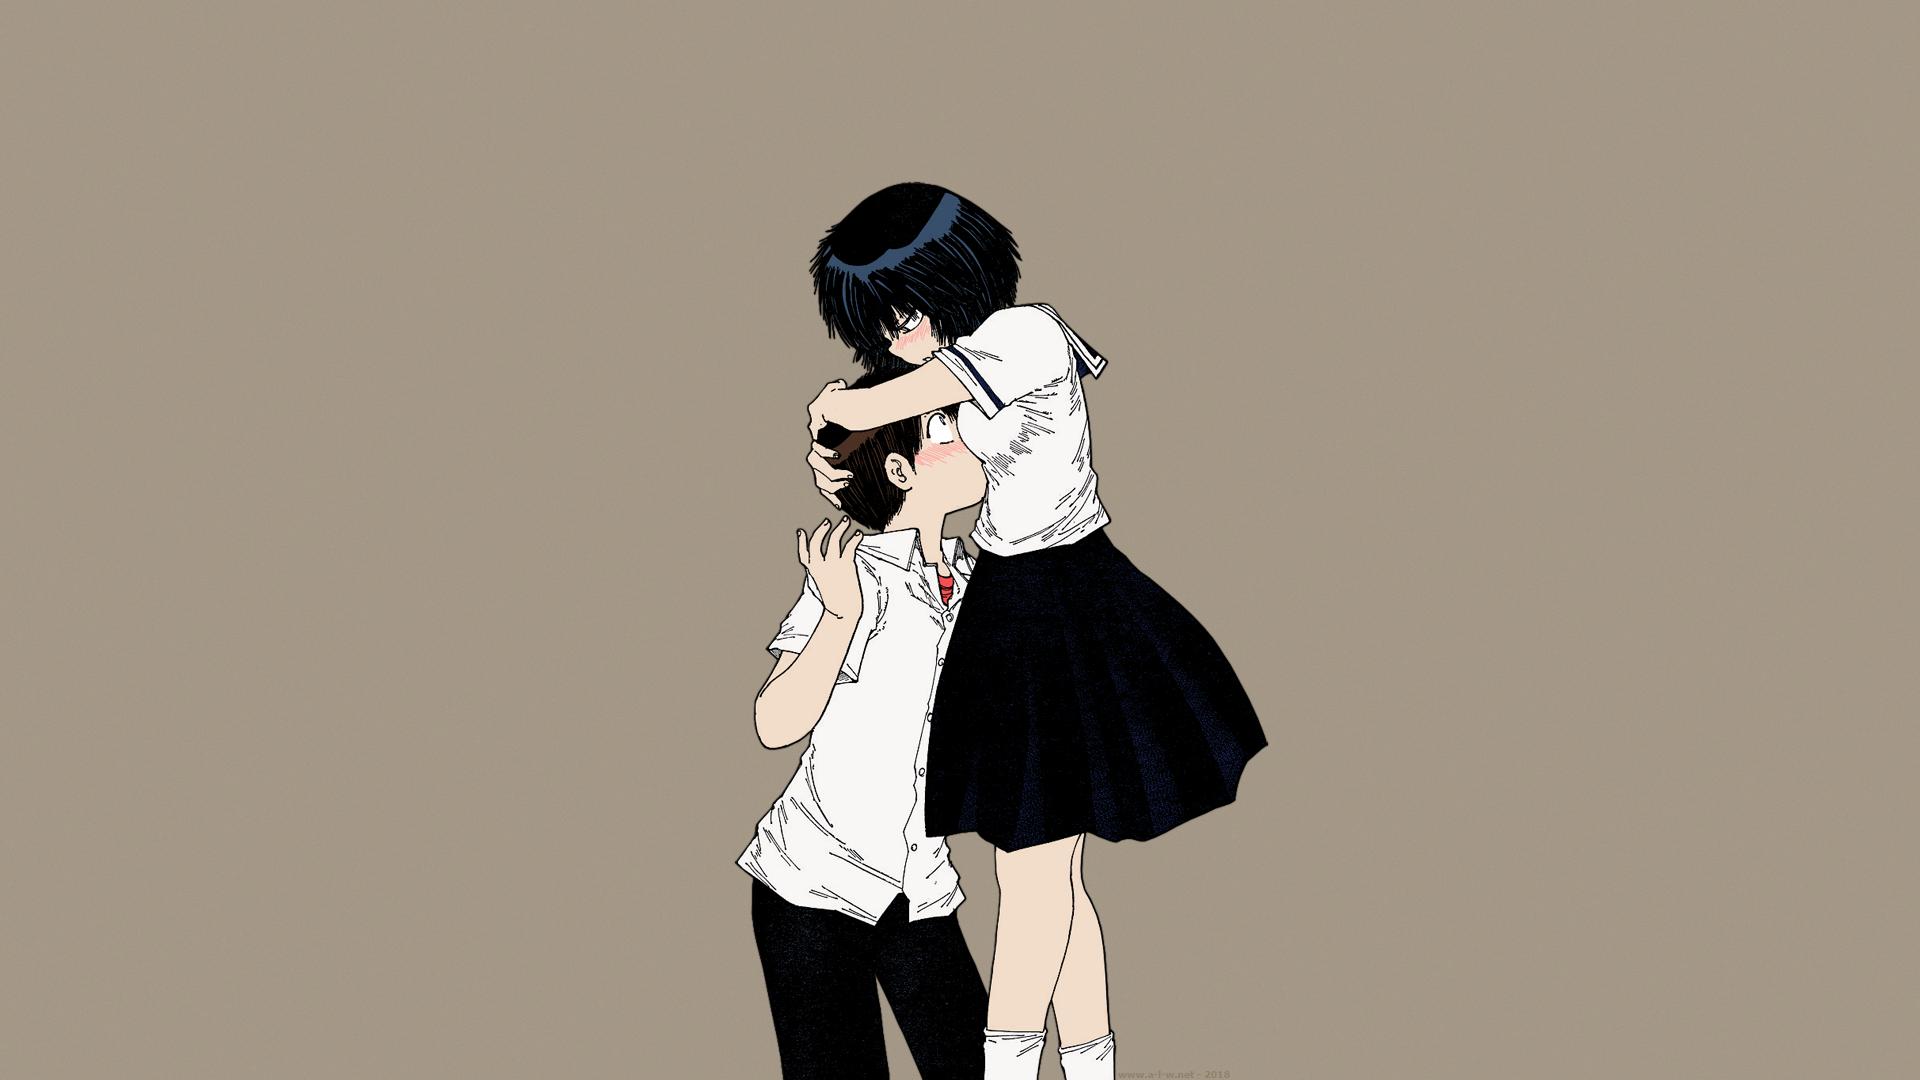 Anime 1920x1080 Nazo no Kanojo X Mysterious Girlfriend X Urabe Mikoto anime manga anime girls Ueshiba Riichi